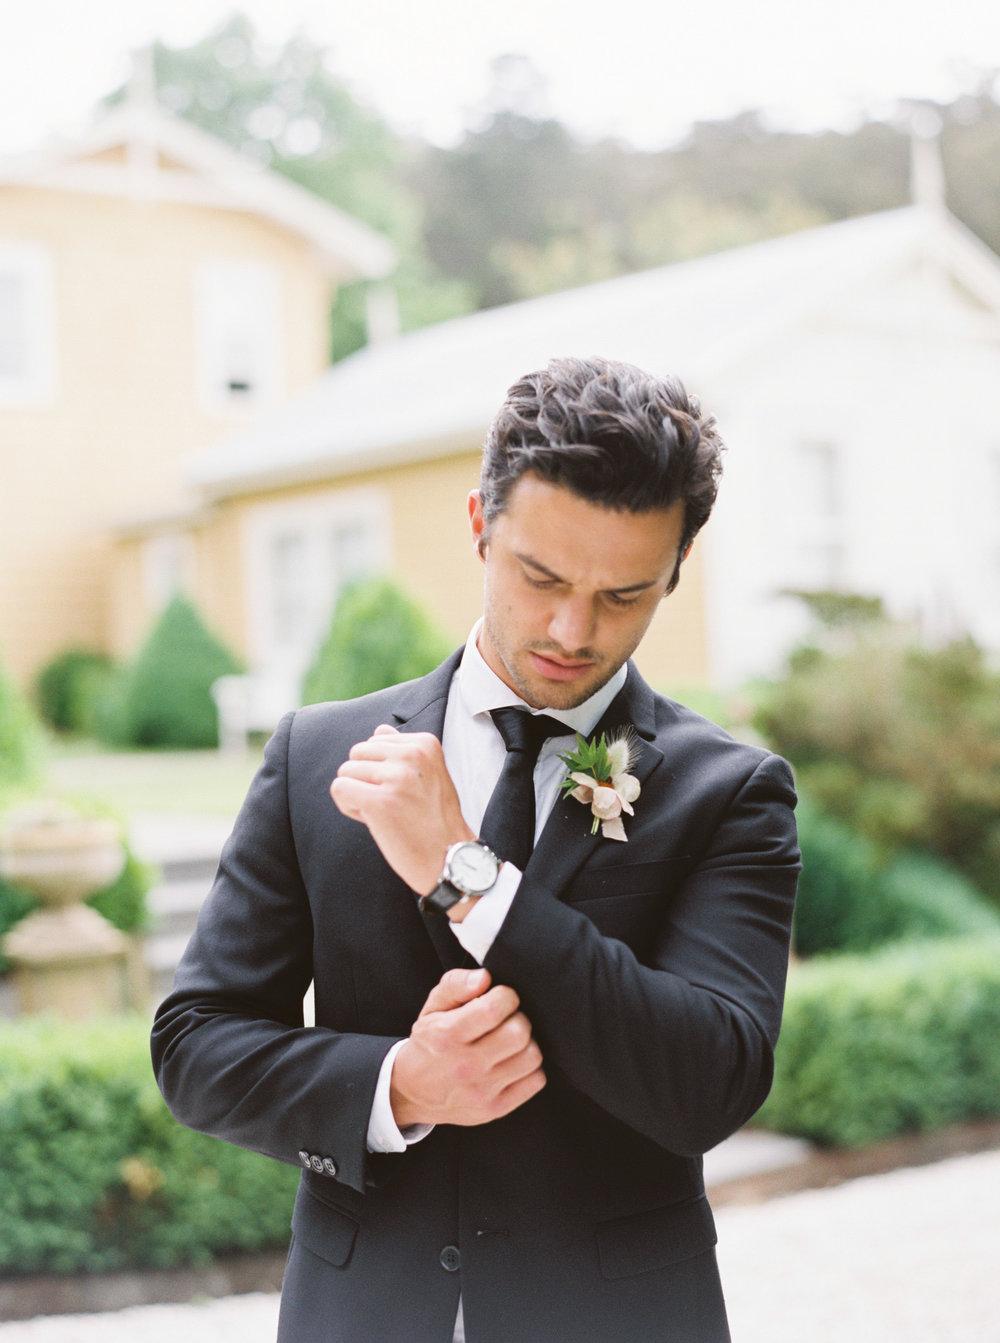 Timeless Southern Highland Wedding Elopement in Bowral NSW Fine Art Film Photographer Sheri McMahon-40.jpg